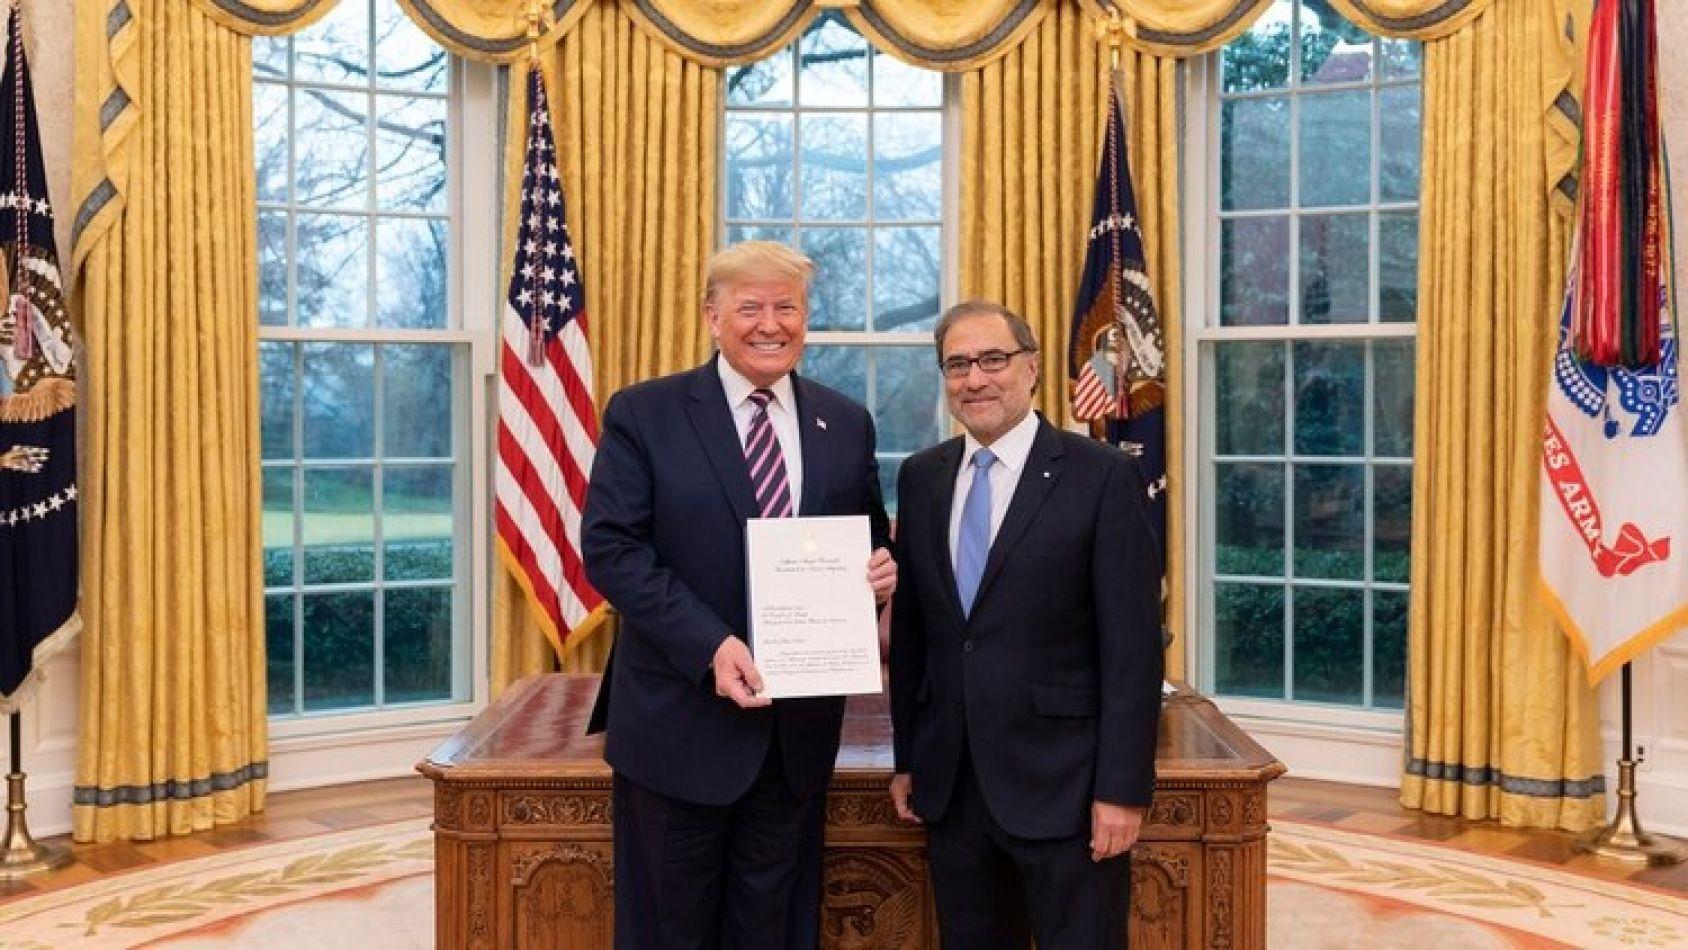 Foto: Twitter Casa Blanca. Trump junto al embajador Jorge Argüello